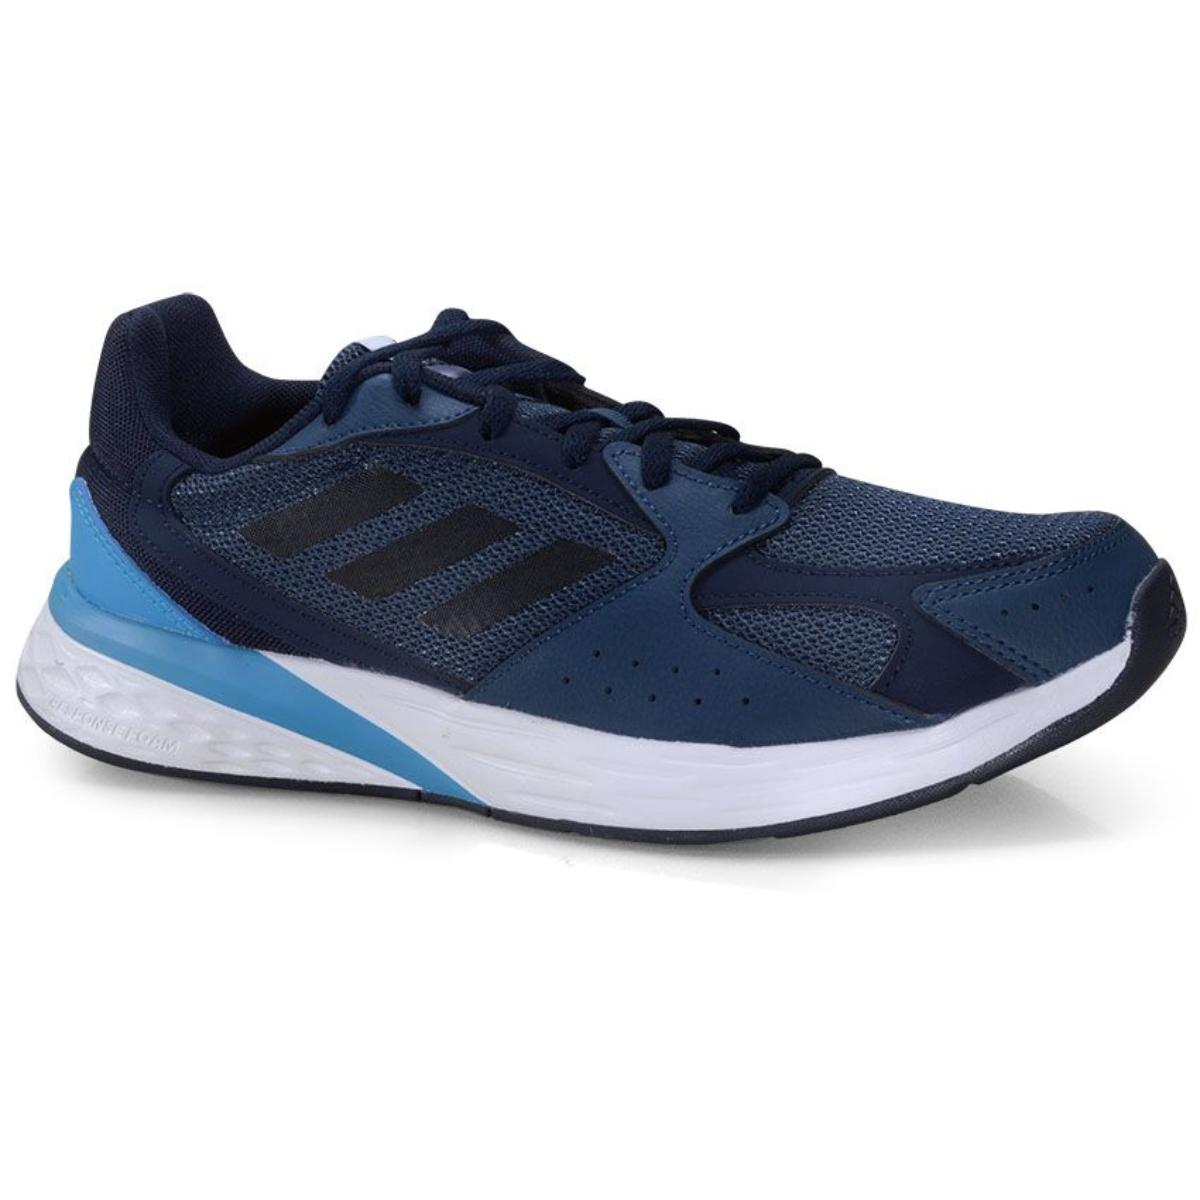 Tênis Masculino Adidas Fy9575 Response Run Marinho